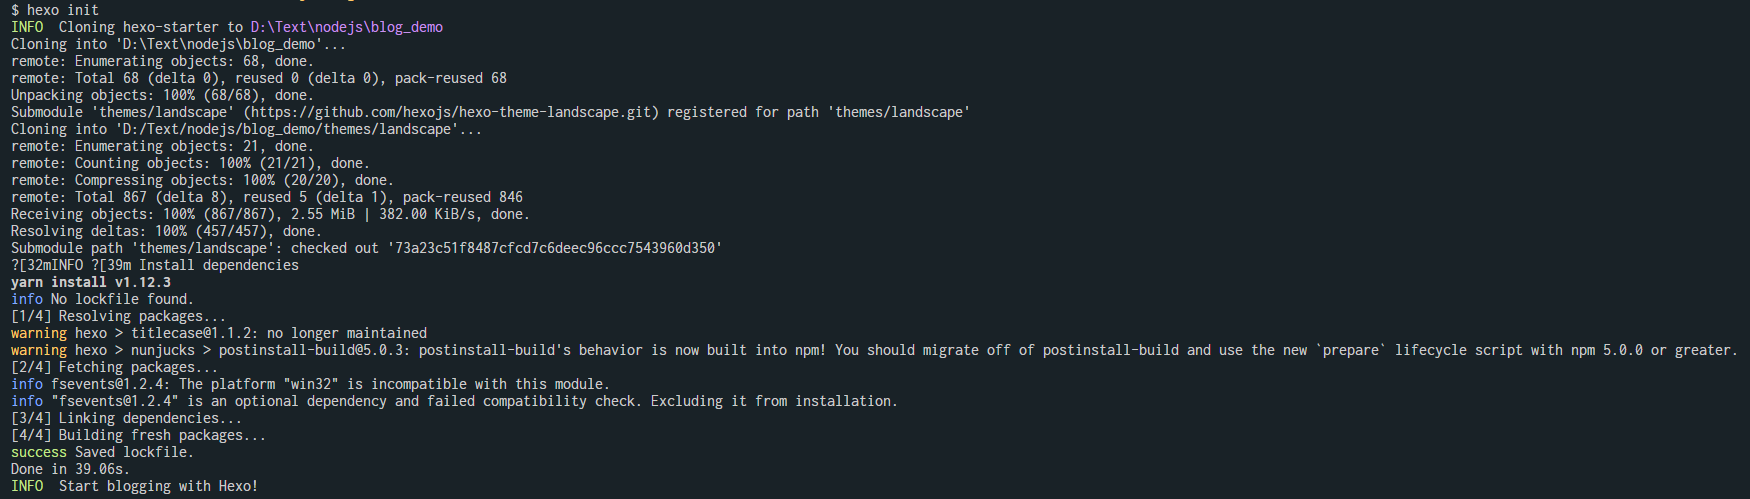 hexo init 输出